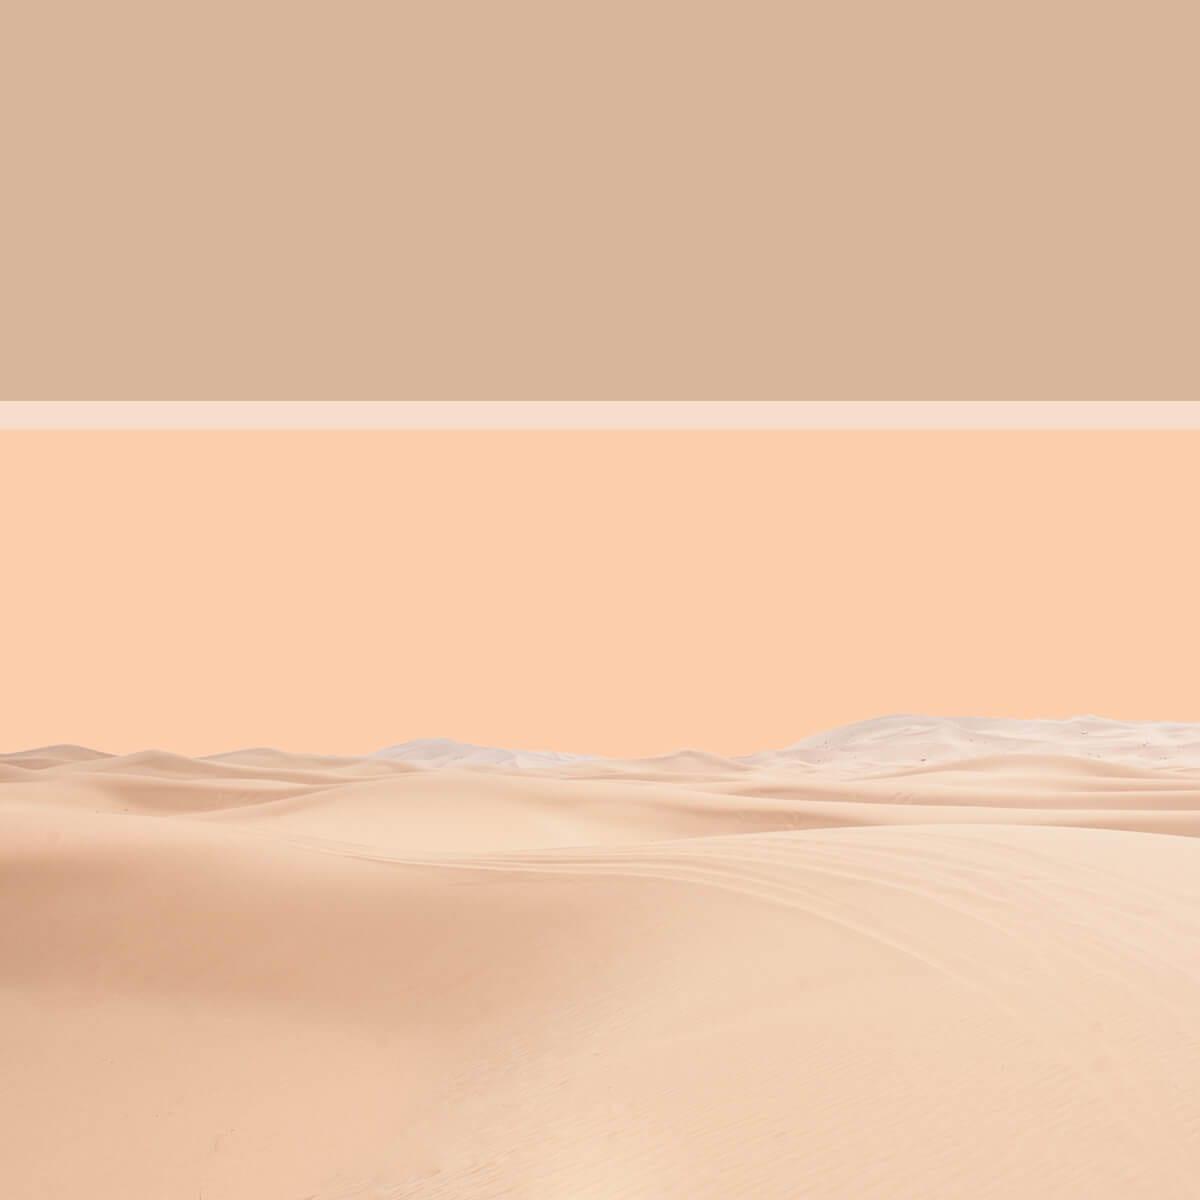 Shades of Sand - Art by Richard Lerma